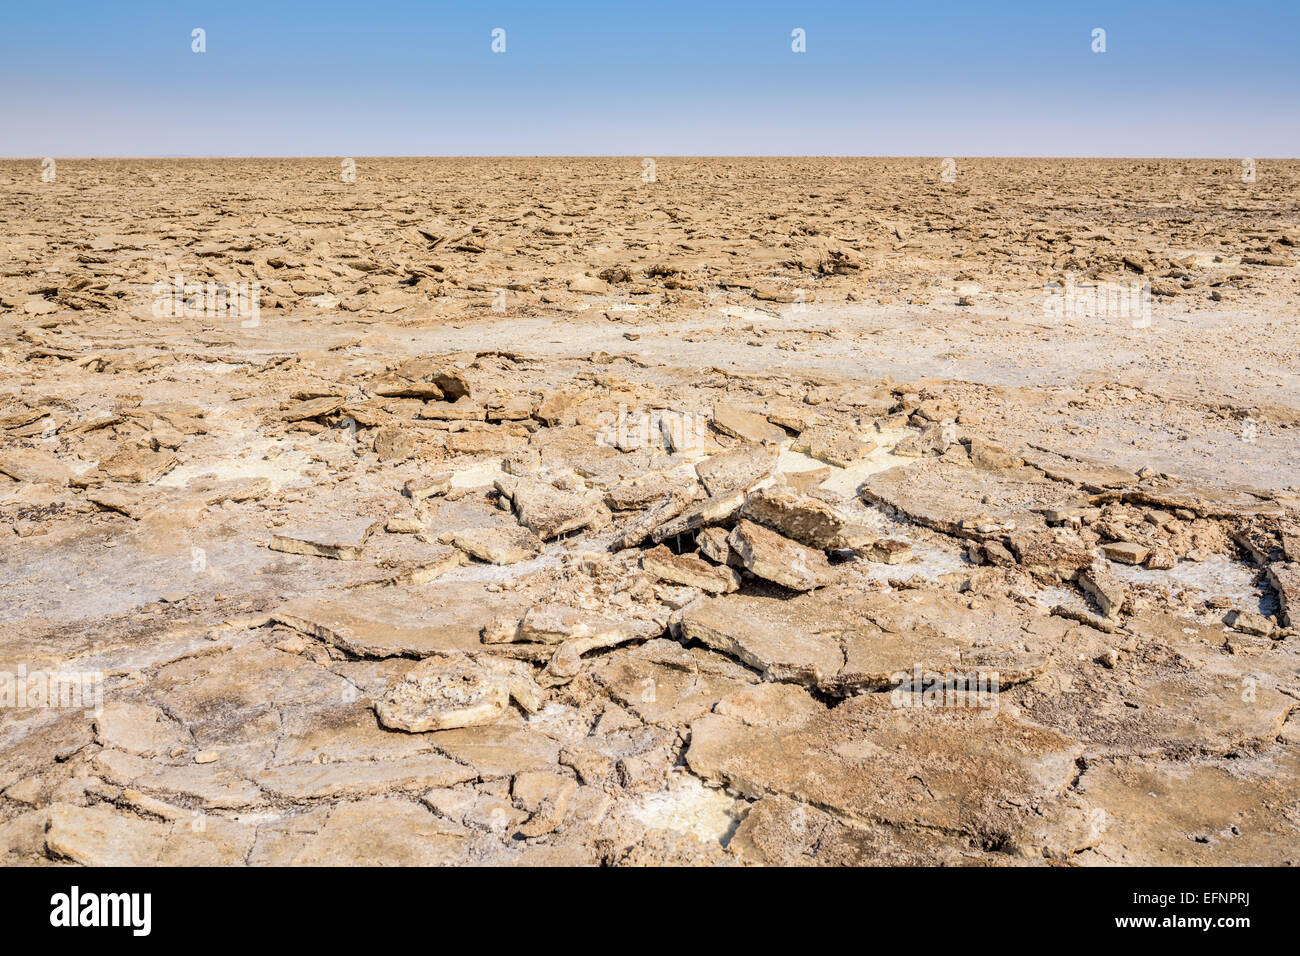 Salt mine in Danakil Depression desert in Ethiopia - Stock Image